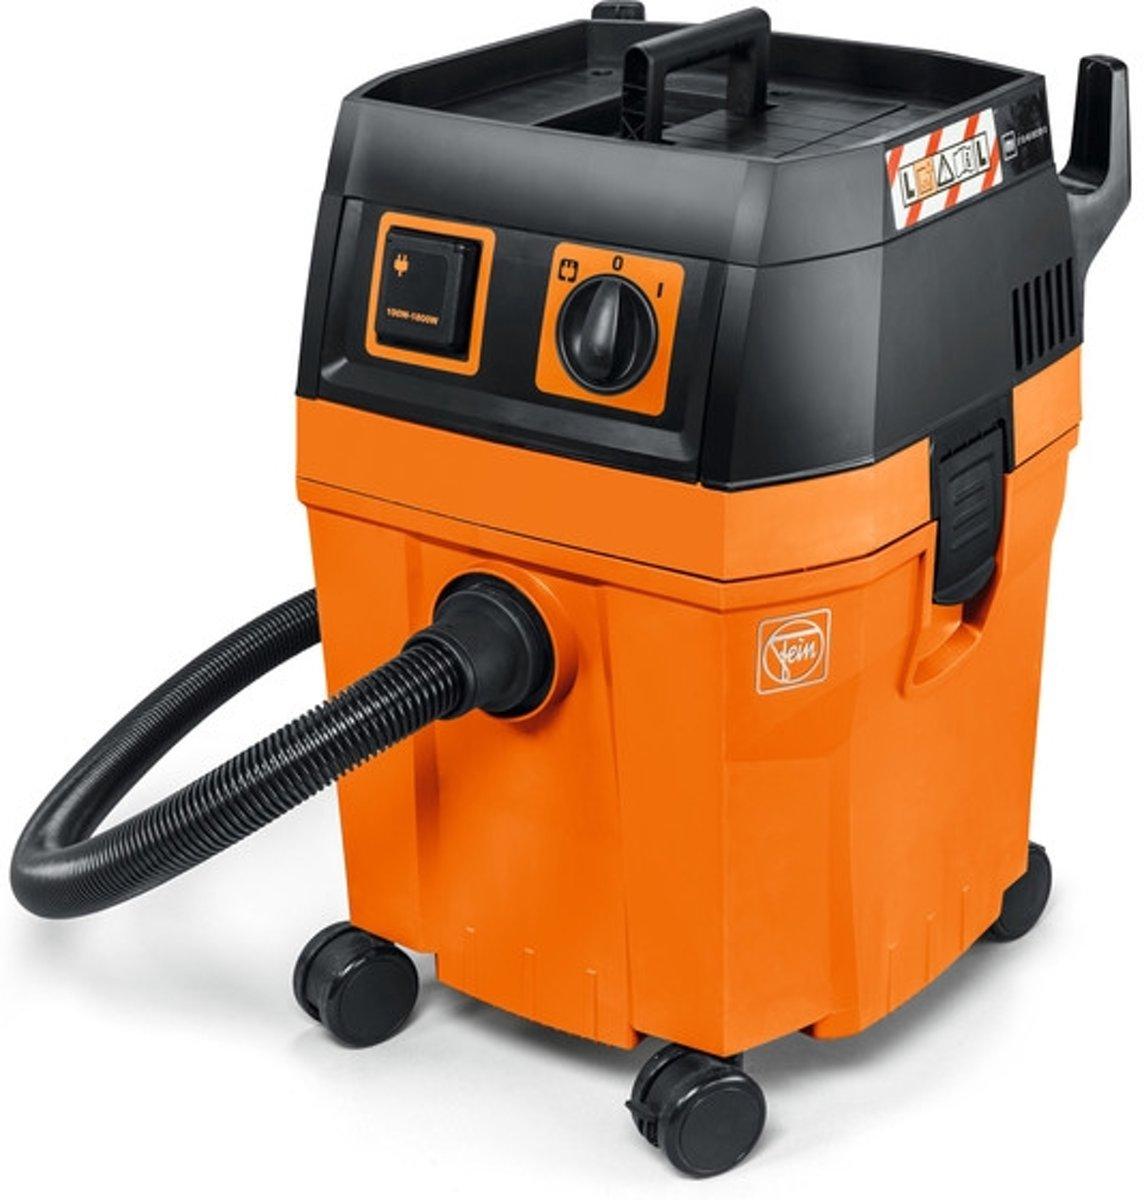 FEIN Dustex 35 L 32l 1380W Zwart, Oranje stofzuiger kopen